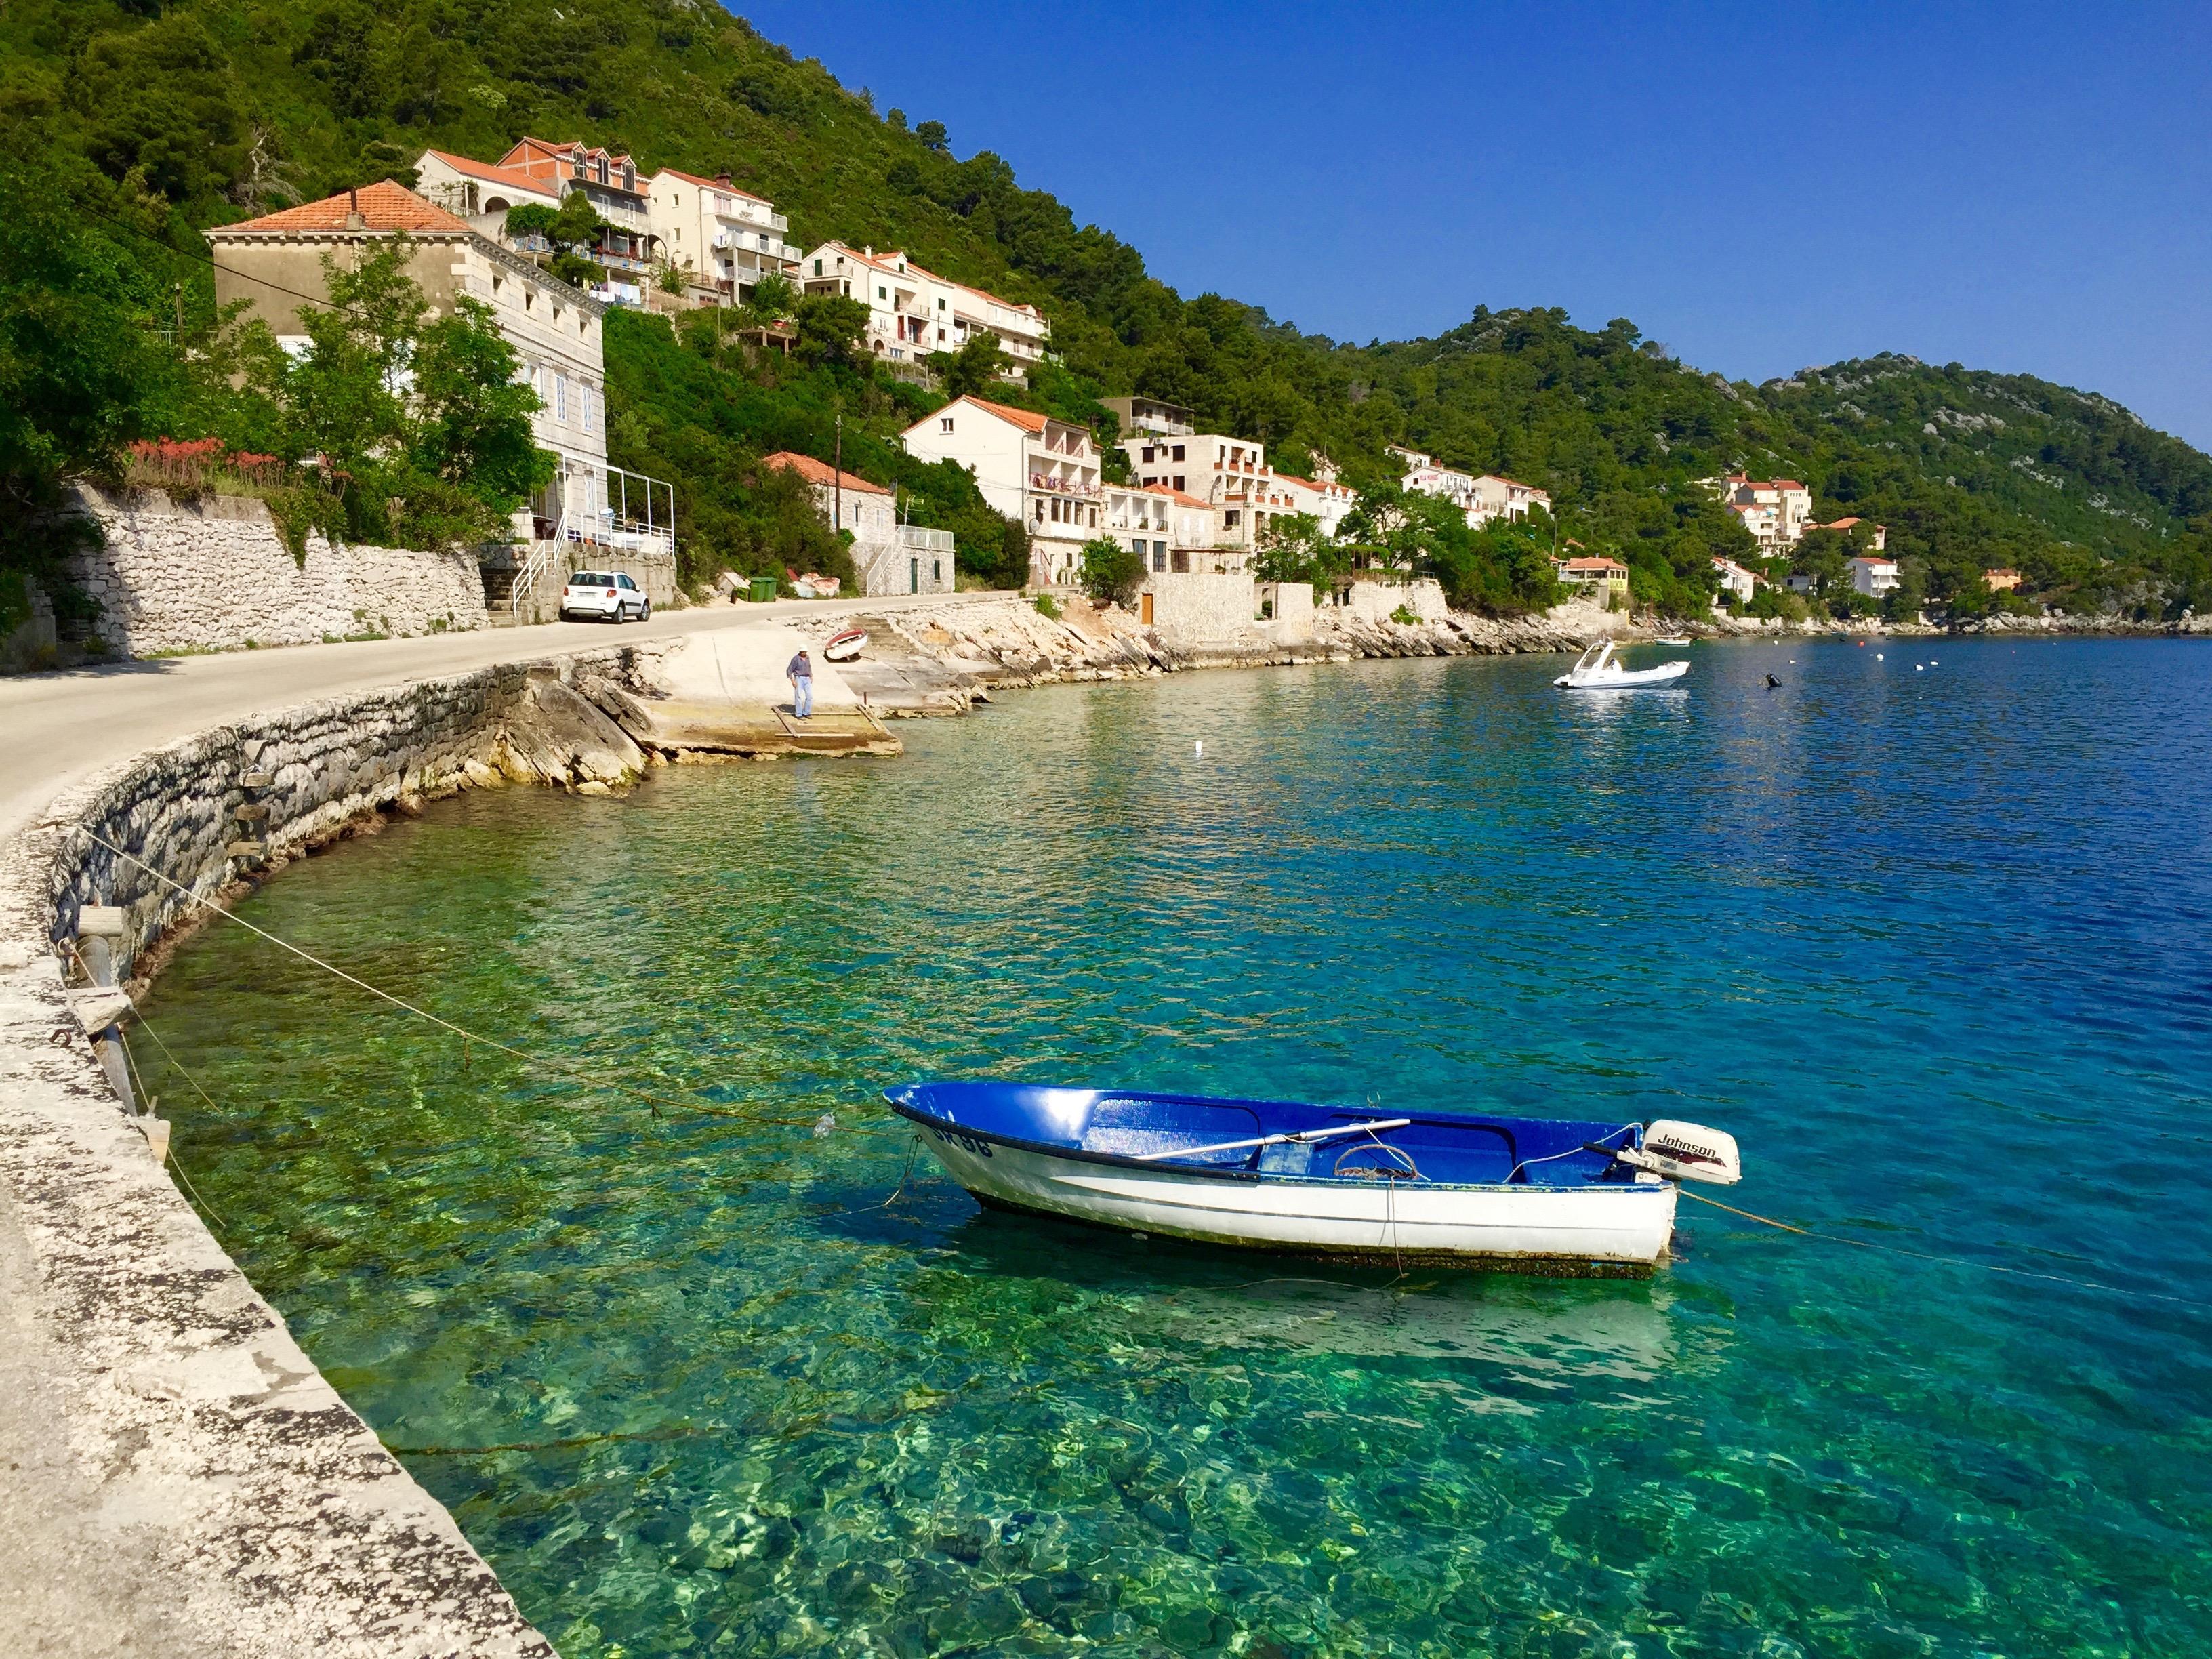 Mljet travel photo | Brodyaga.com image gallery: Croatia, Mljet